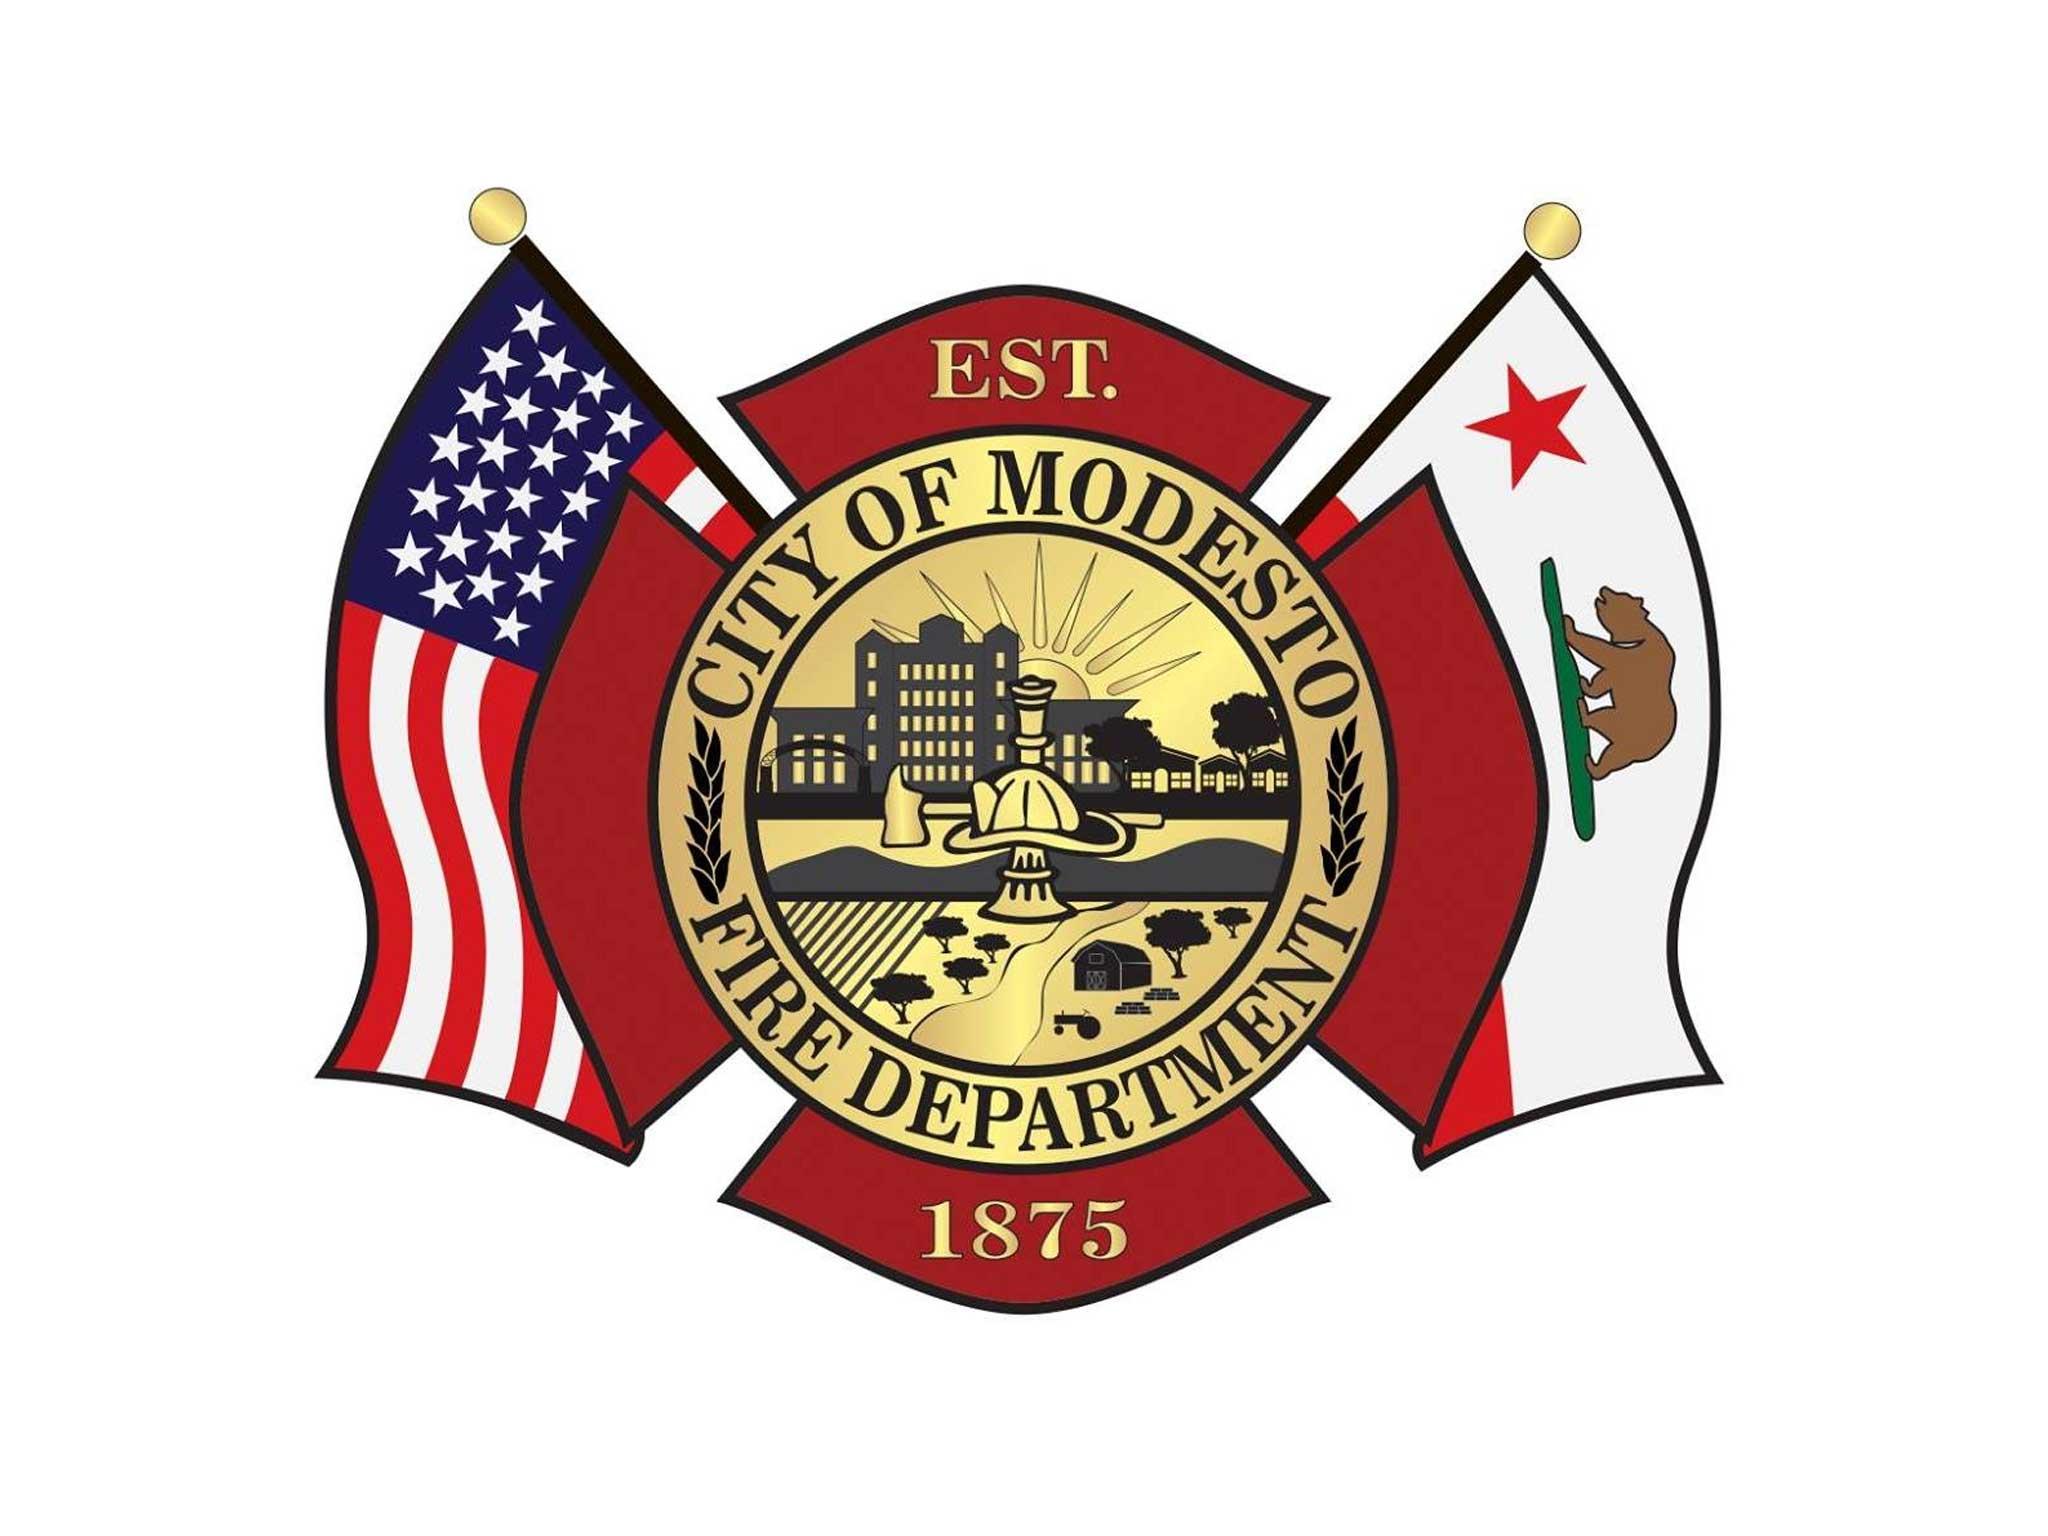 City of Modesto Fire Department CA